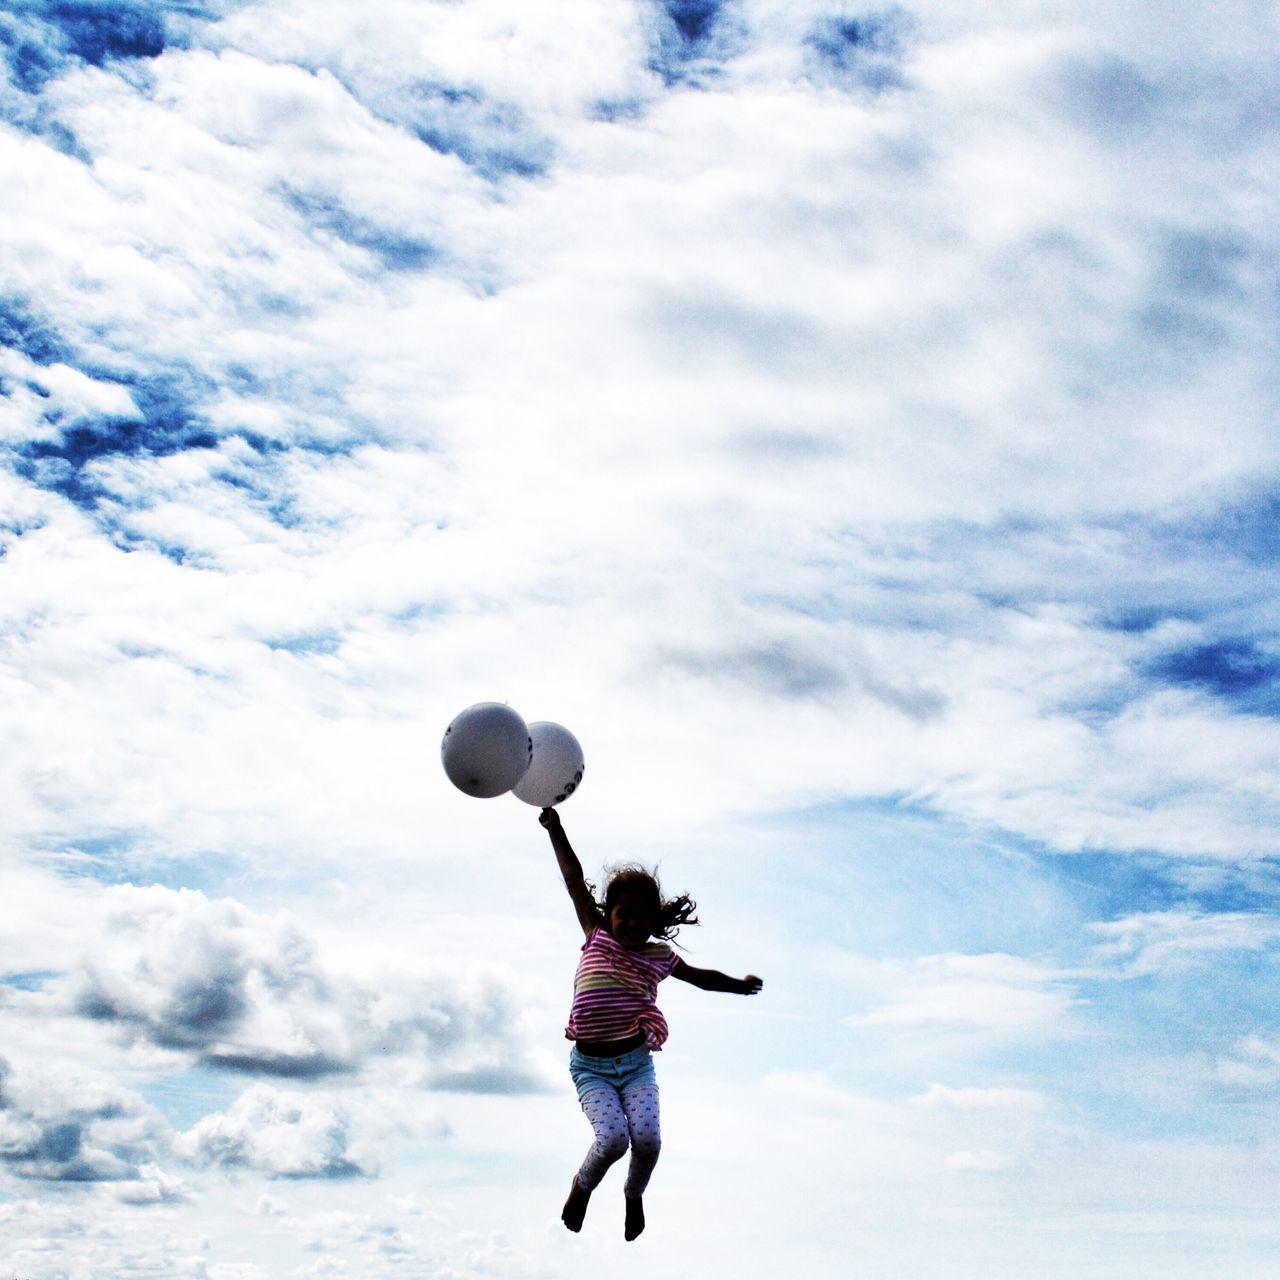 Balloons Ballons Sky Sky And Clouds Happy Jump Kid Himmel Ciel Enjoying Life EnjoyTheMoment